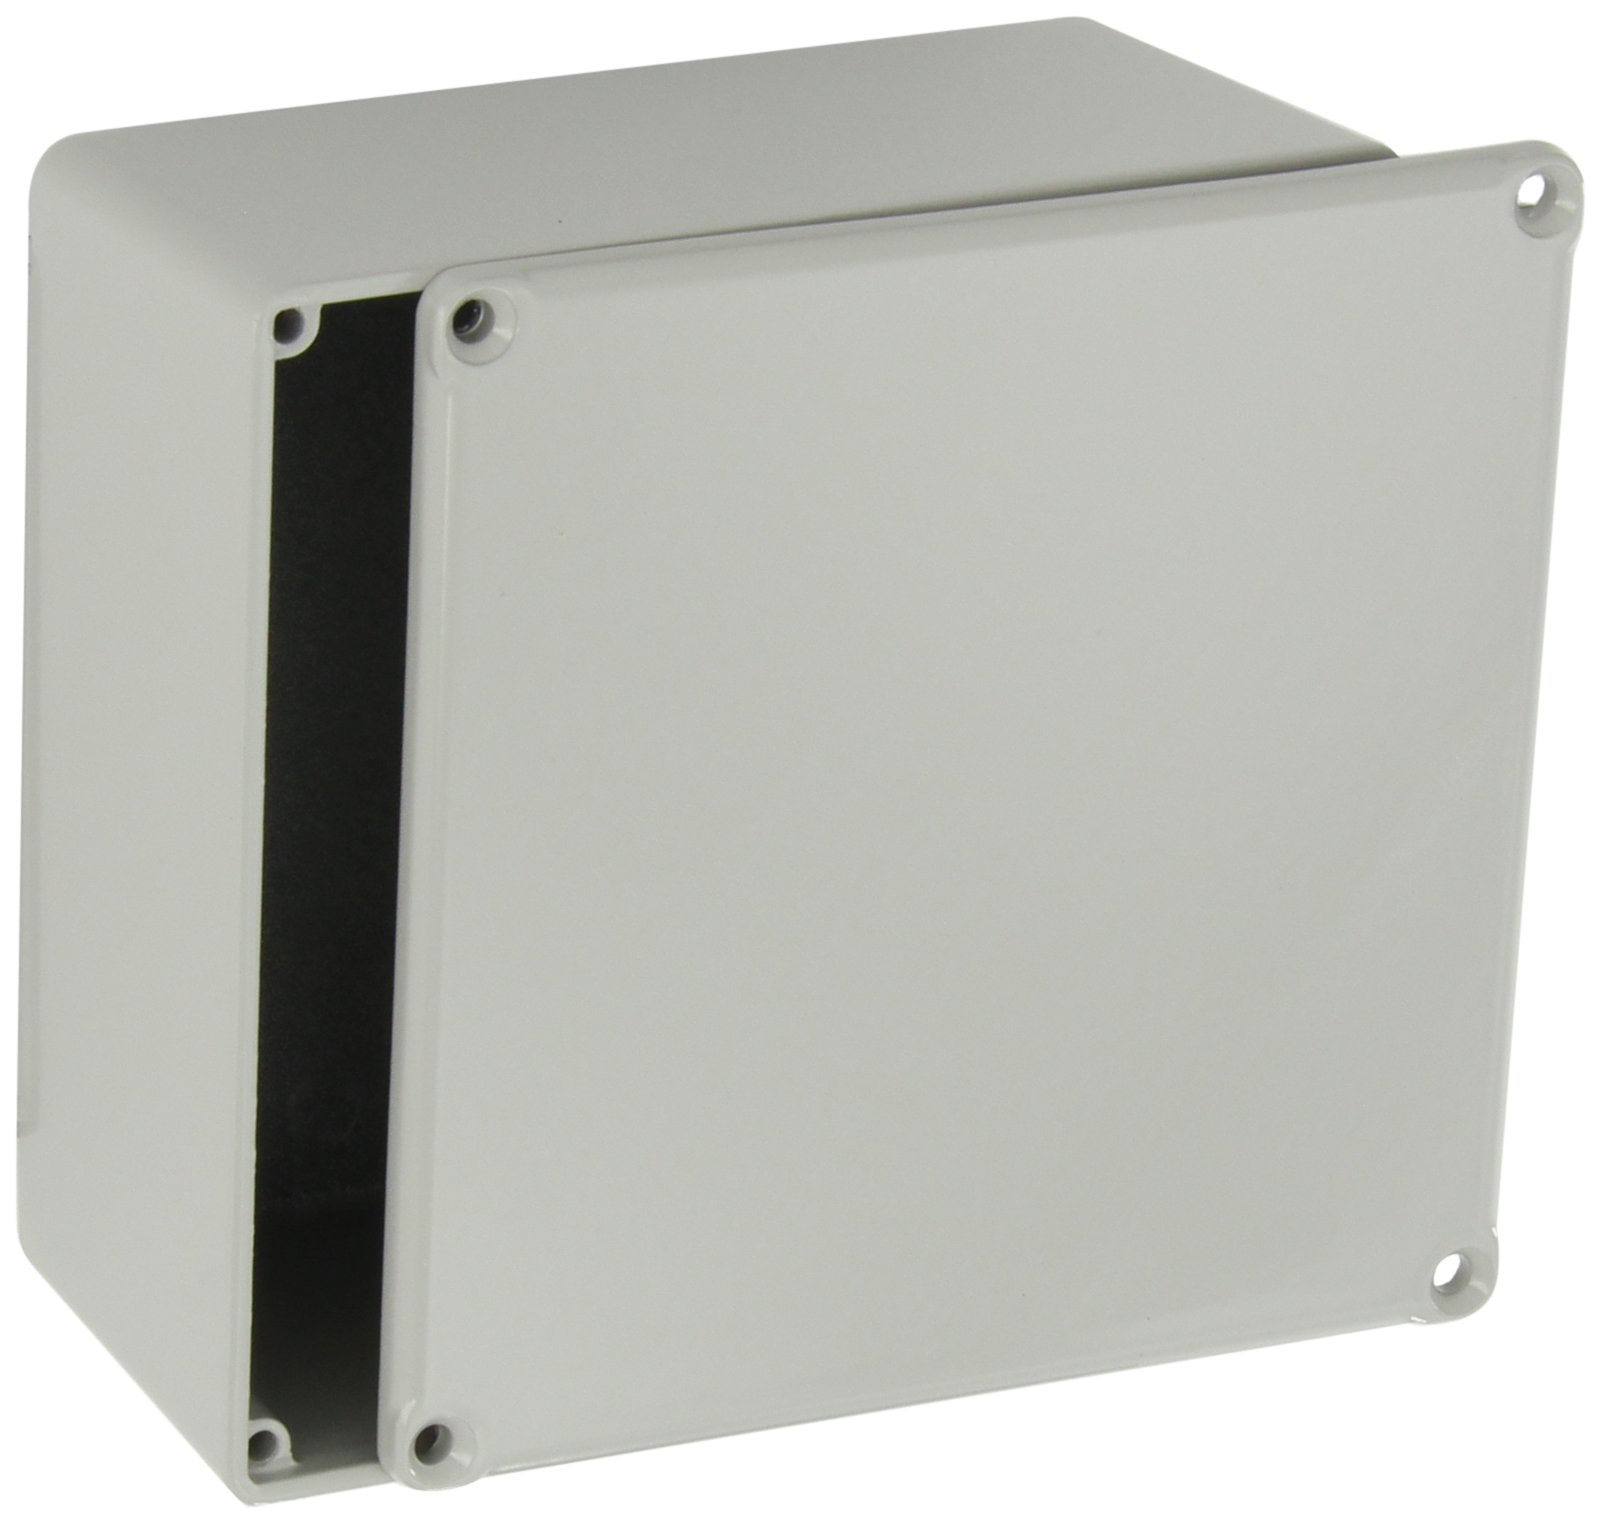 BUD Industries CU-474-G Aluminum Econobox, 4-3/4'' Length x 4-3/4'' Width x 2-21/64'' Height, Gray Painted Finish